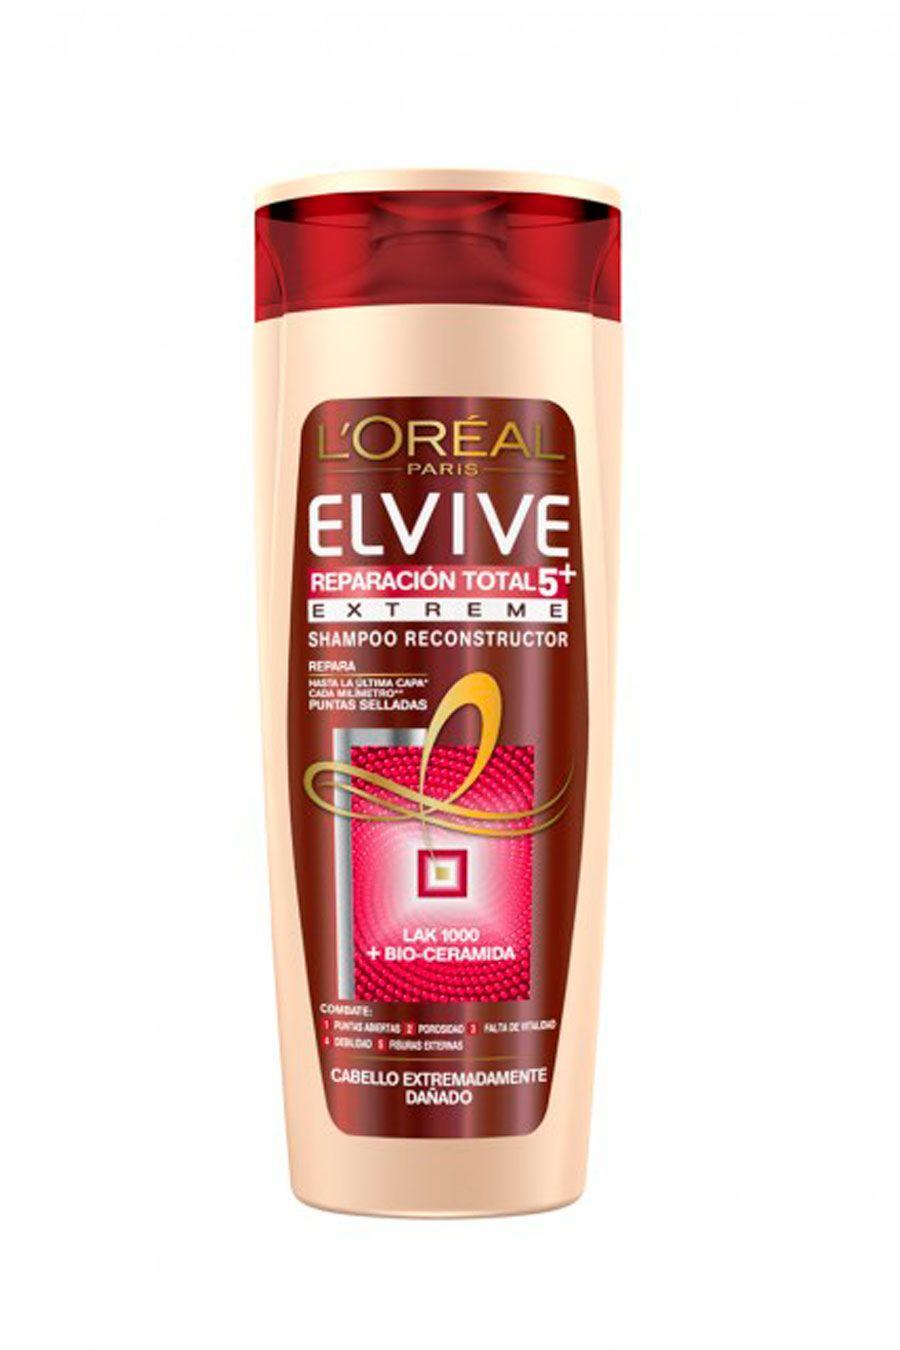 Elvive Reparacion Total Extreme Shampoo Combate Puntas Abiertas